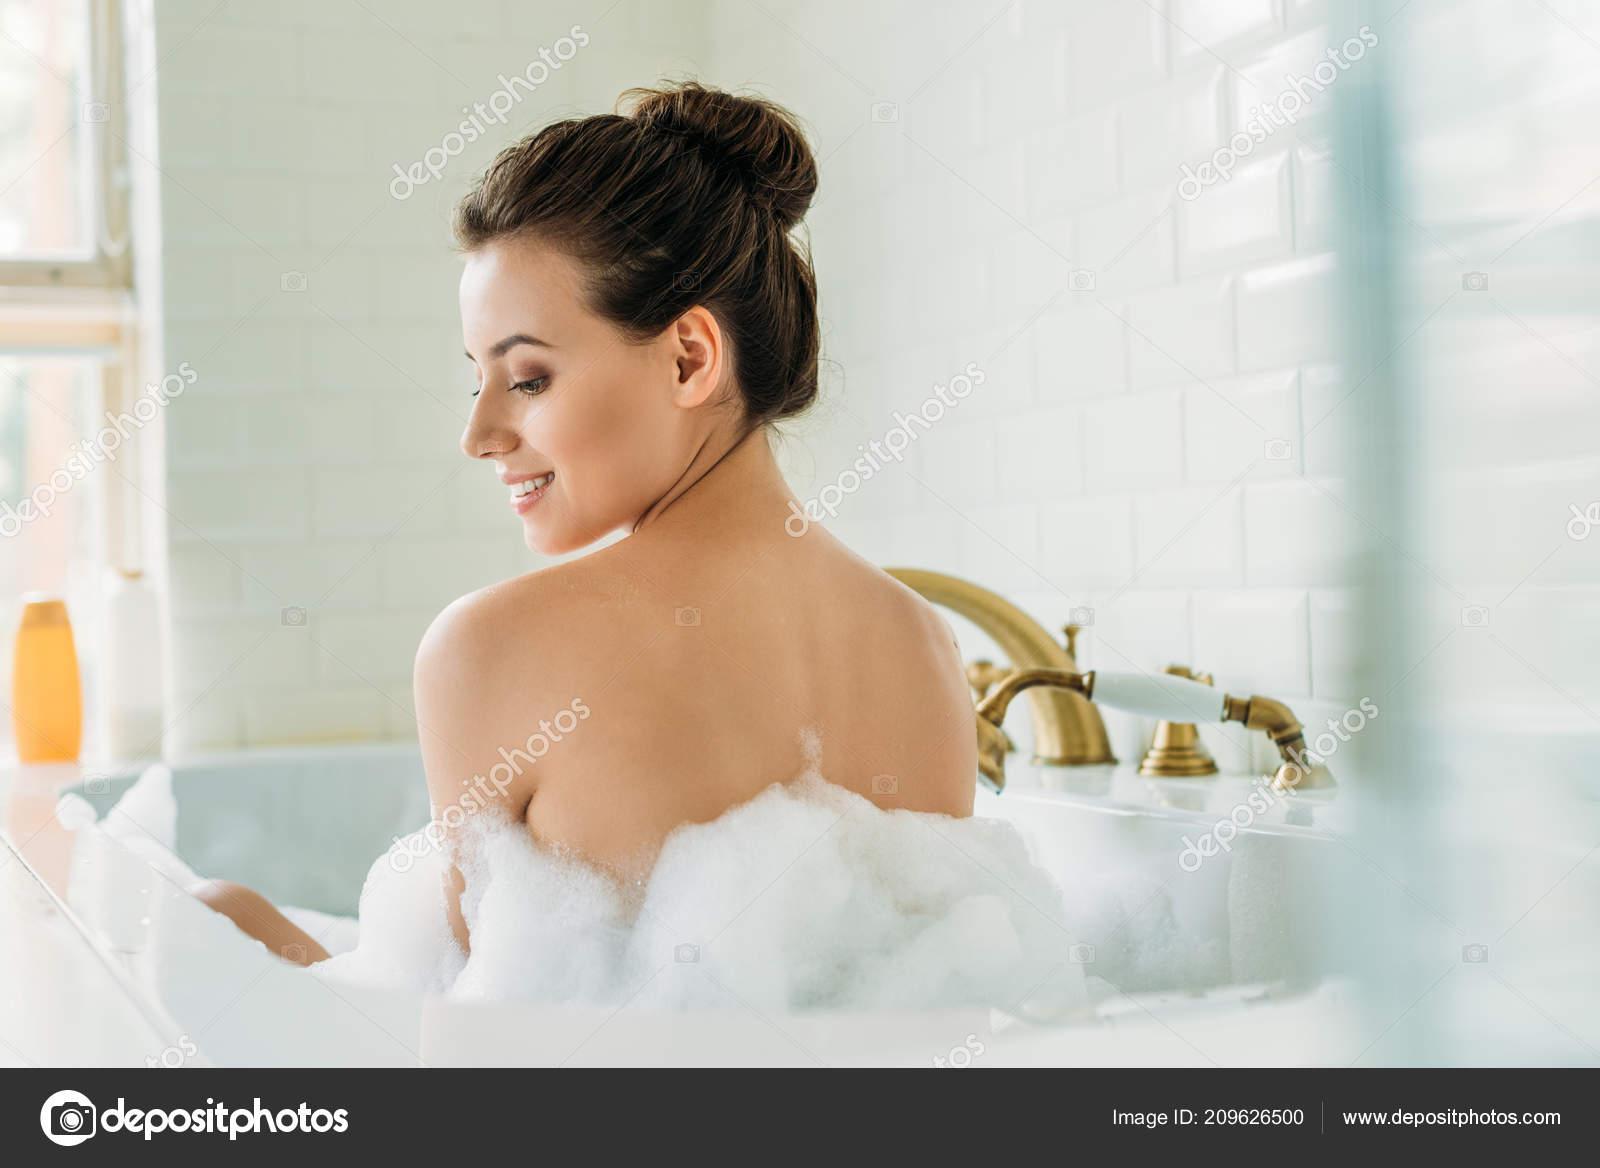 Think, Nude girl bath tub something is